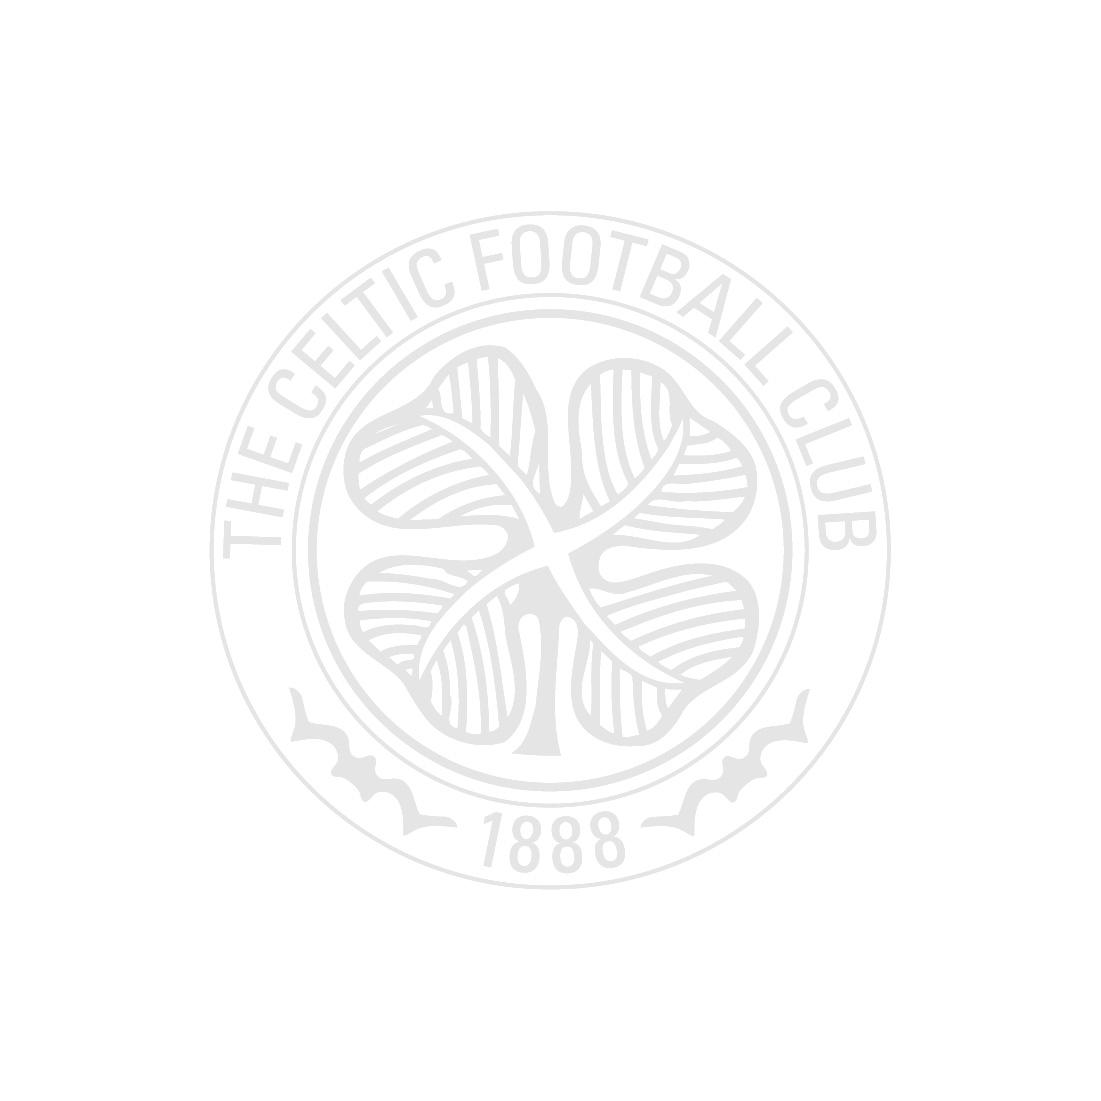 Celtic Dembele Poster